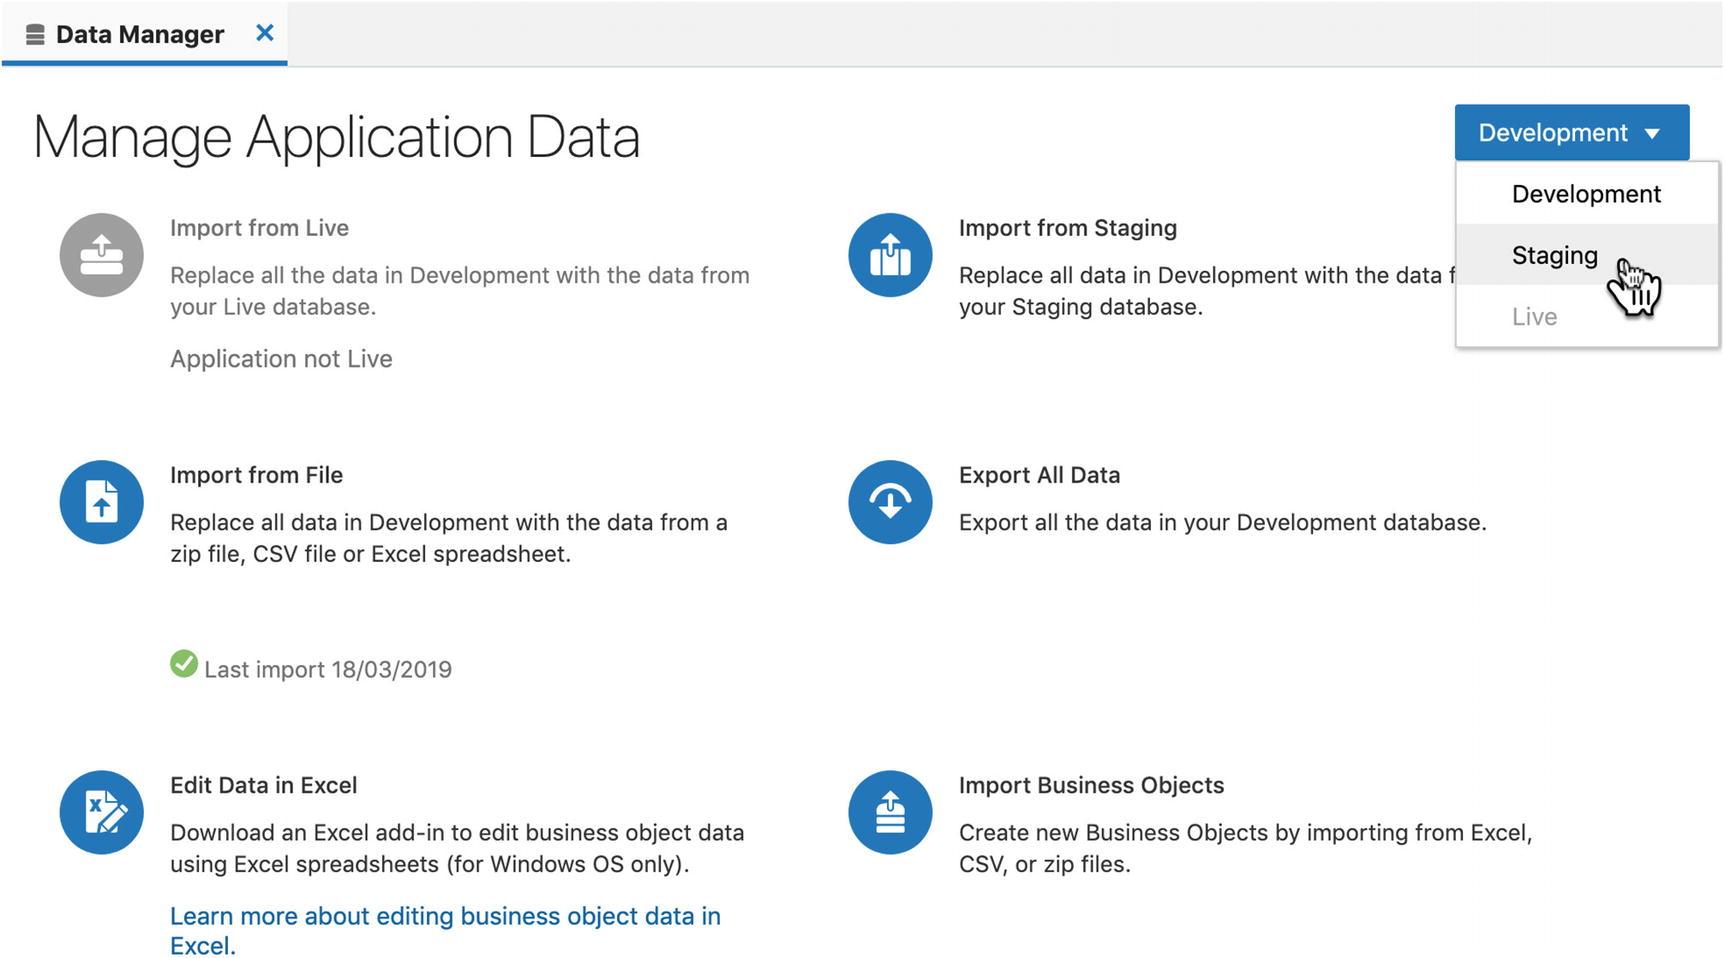 Working with Data   SpringerLink